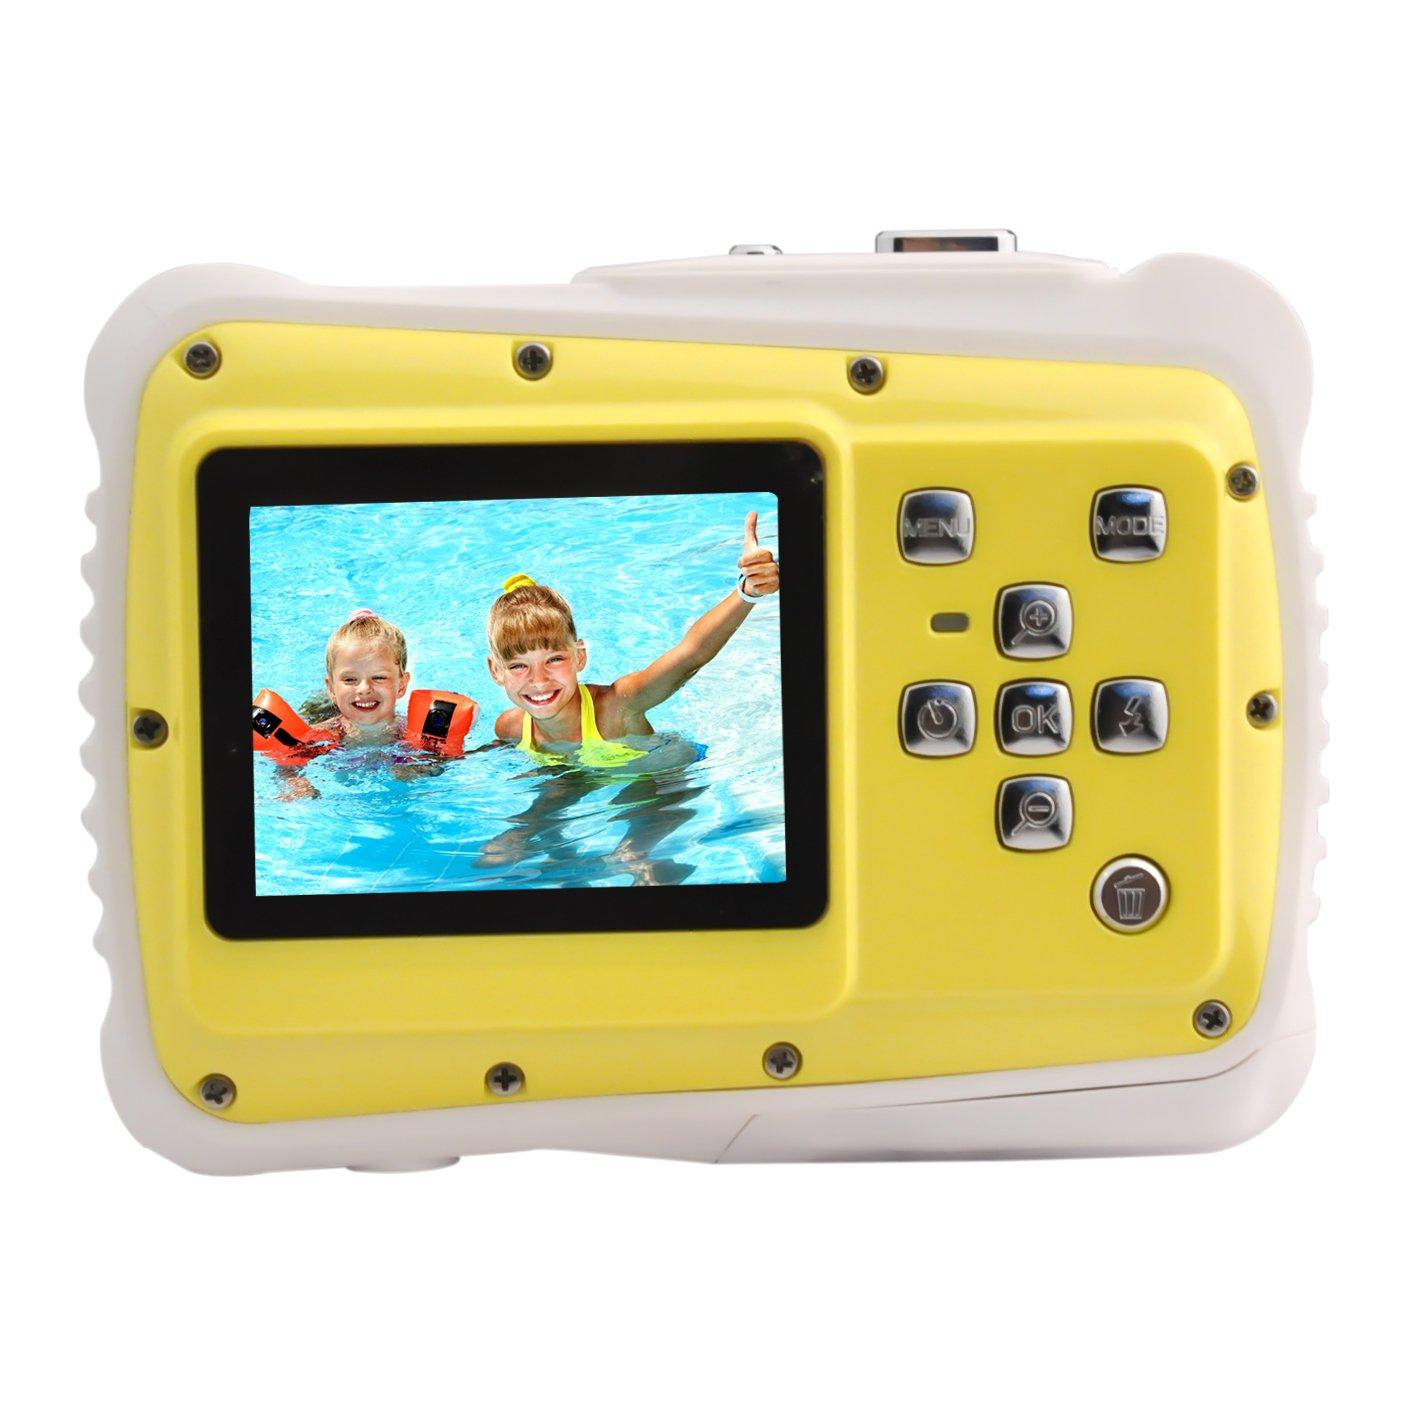 Powpro Kfun PP-J52 Underwater Action Camera Waterproof Dustproof Kids Camera Camcorder 5M Pixels (Yellow) .